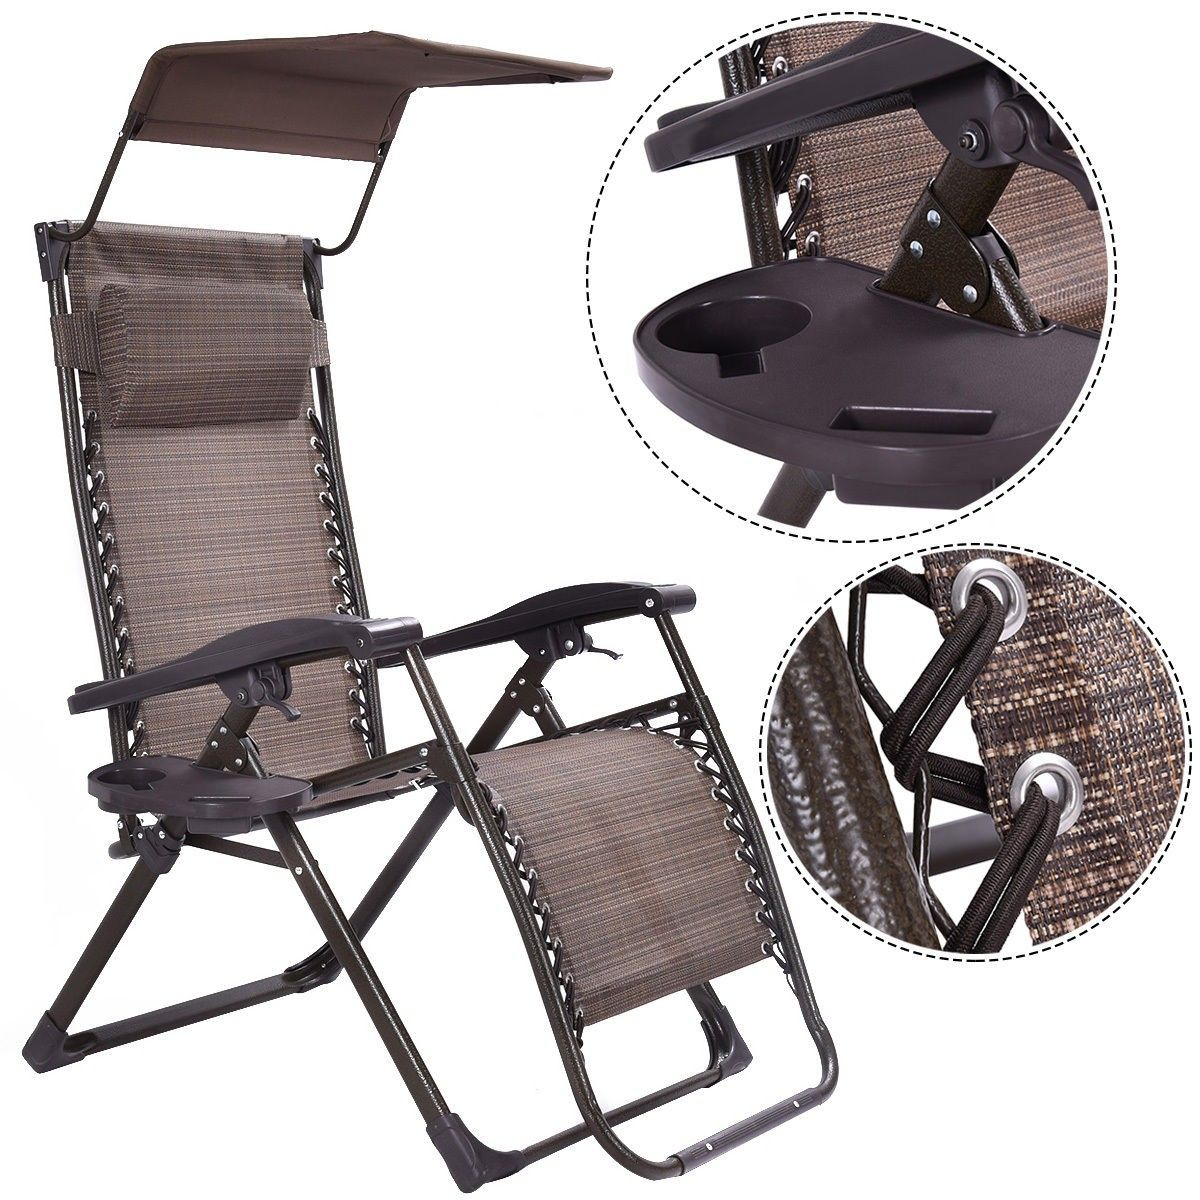 Foldable Zero Gravity Chair Lounge Patio Outdoor Yard Recliner W/  Sunshade+Tray